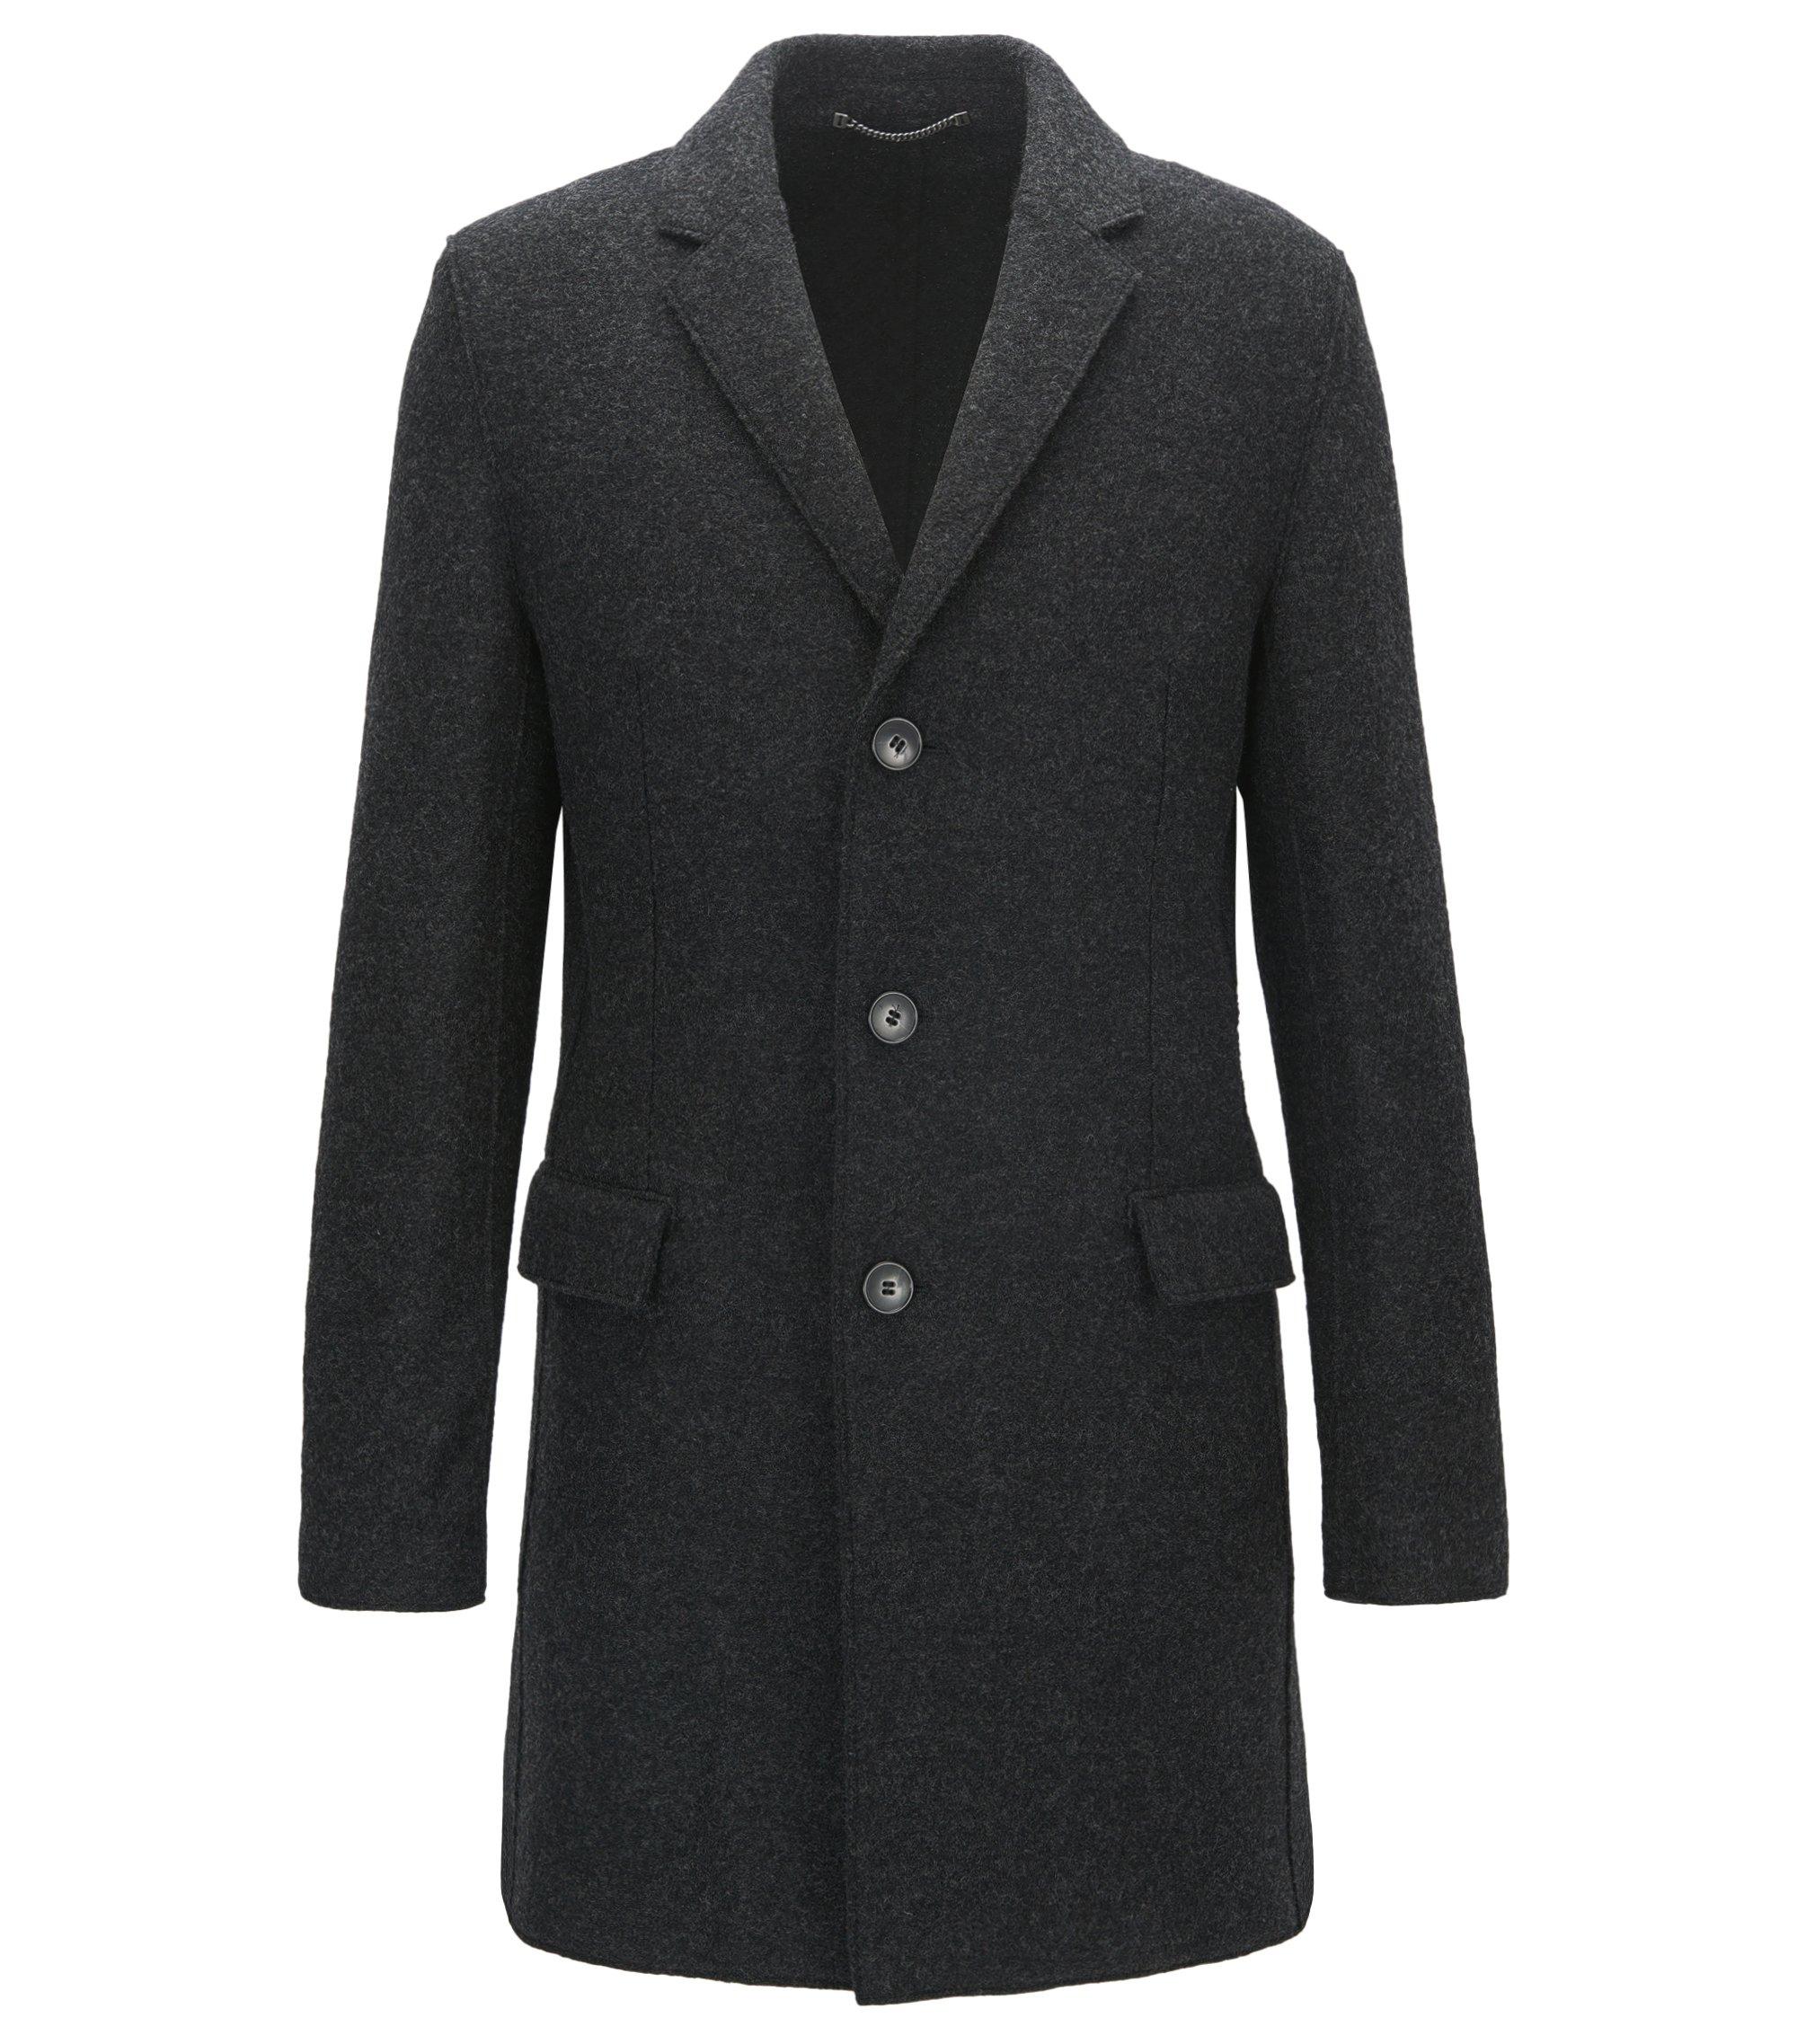 Cappotto slim fit in lana vergine mélange con revers classici, Grigio antracite